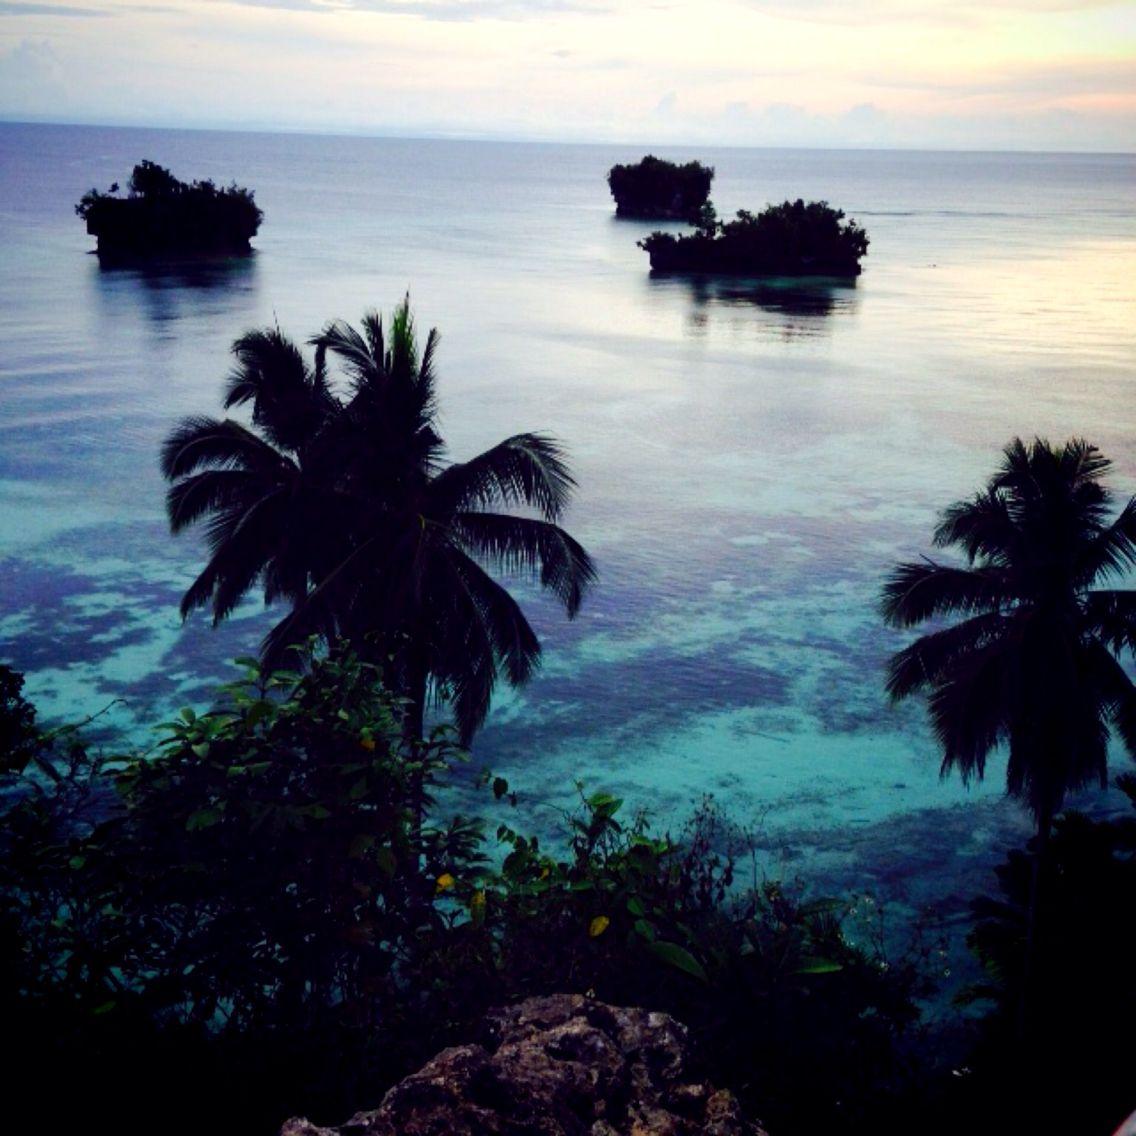 West from the island Adoki village. Biak,papua